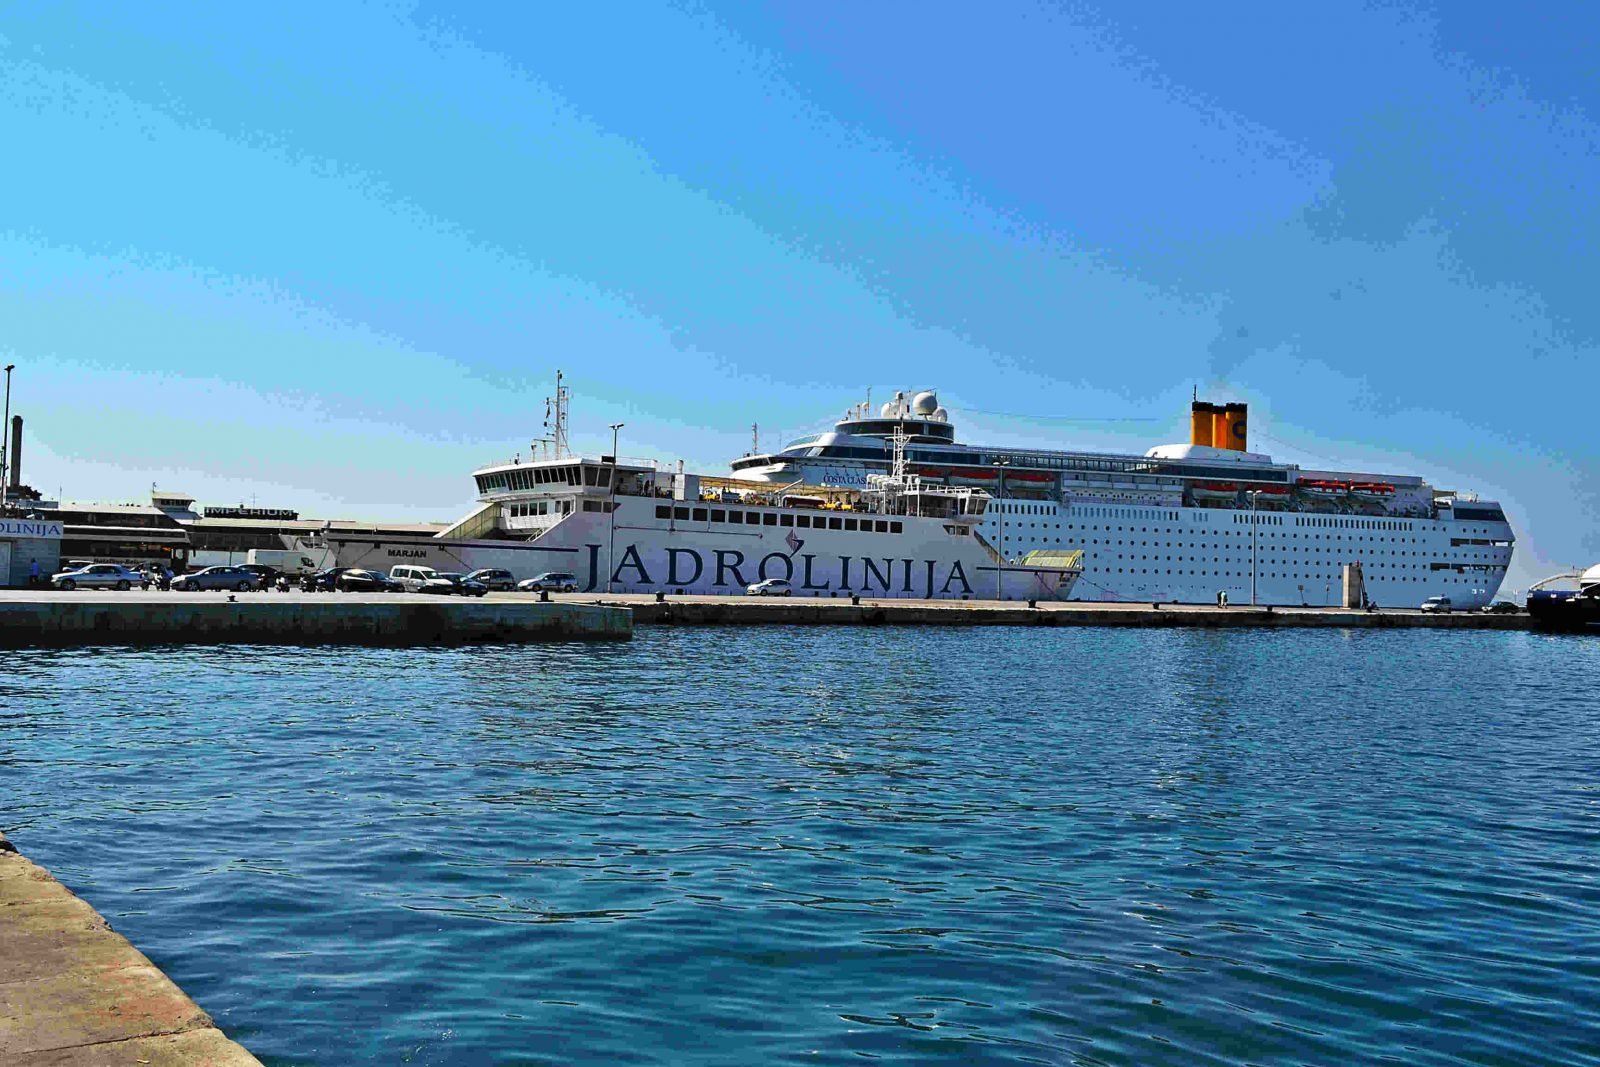 ferry boat jadrolinija na Croácia